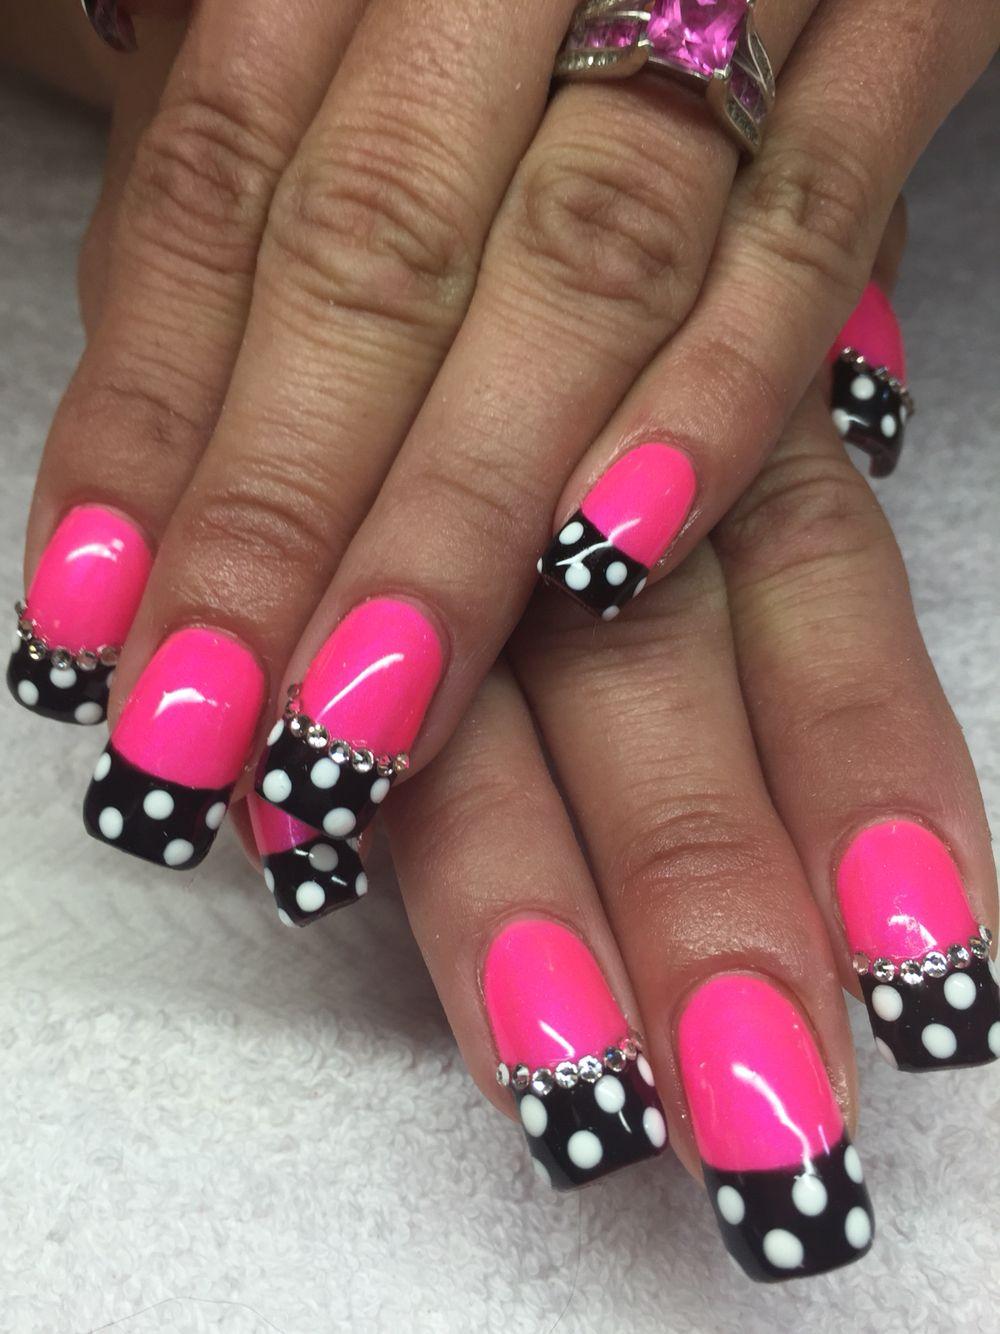 hot pink and black with polkadots